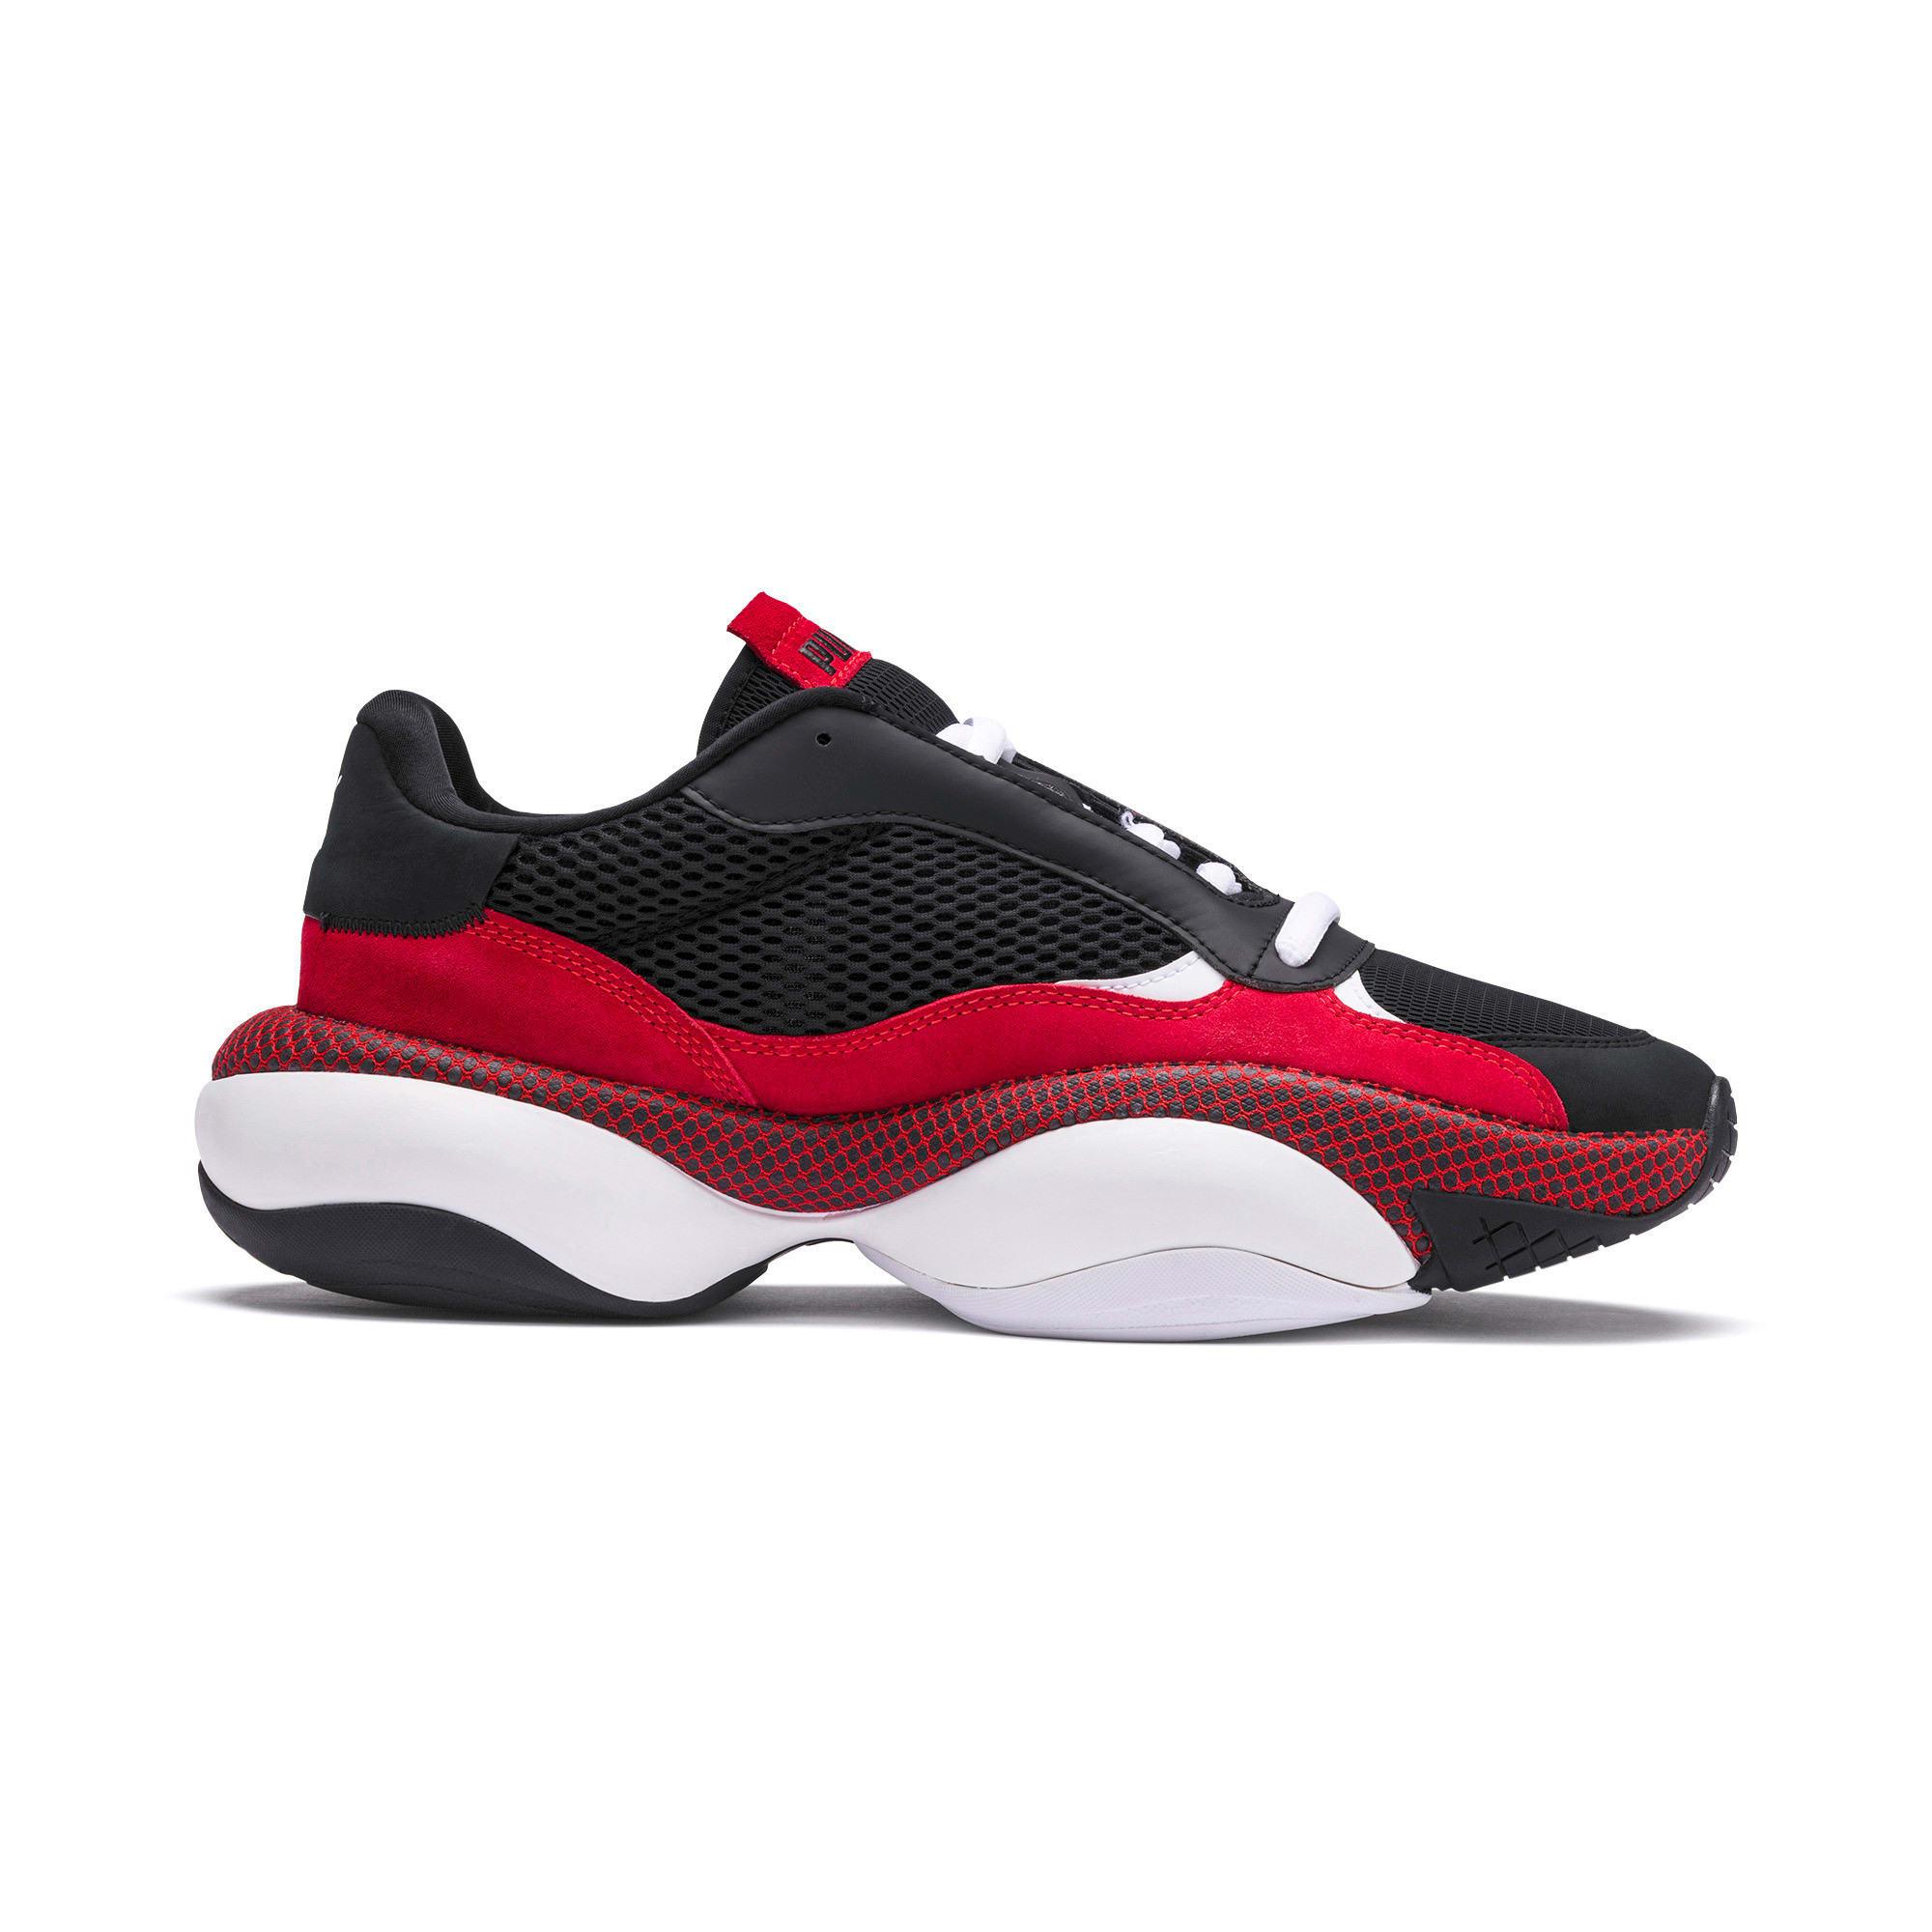 Thumbnail 6 of Alteration Blitz Sneakers, Puma Black-High Risk Red, medium